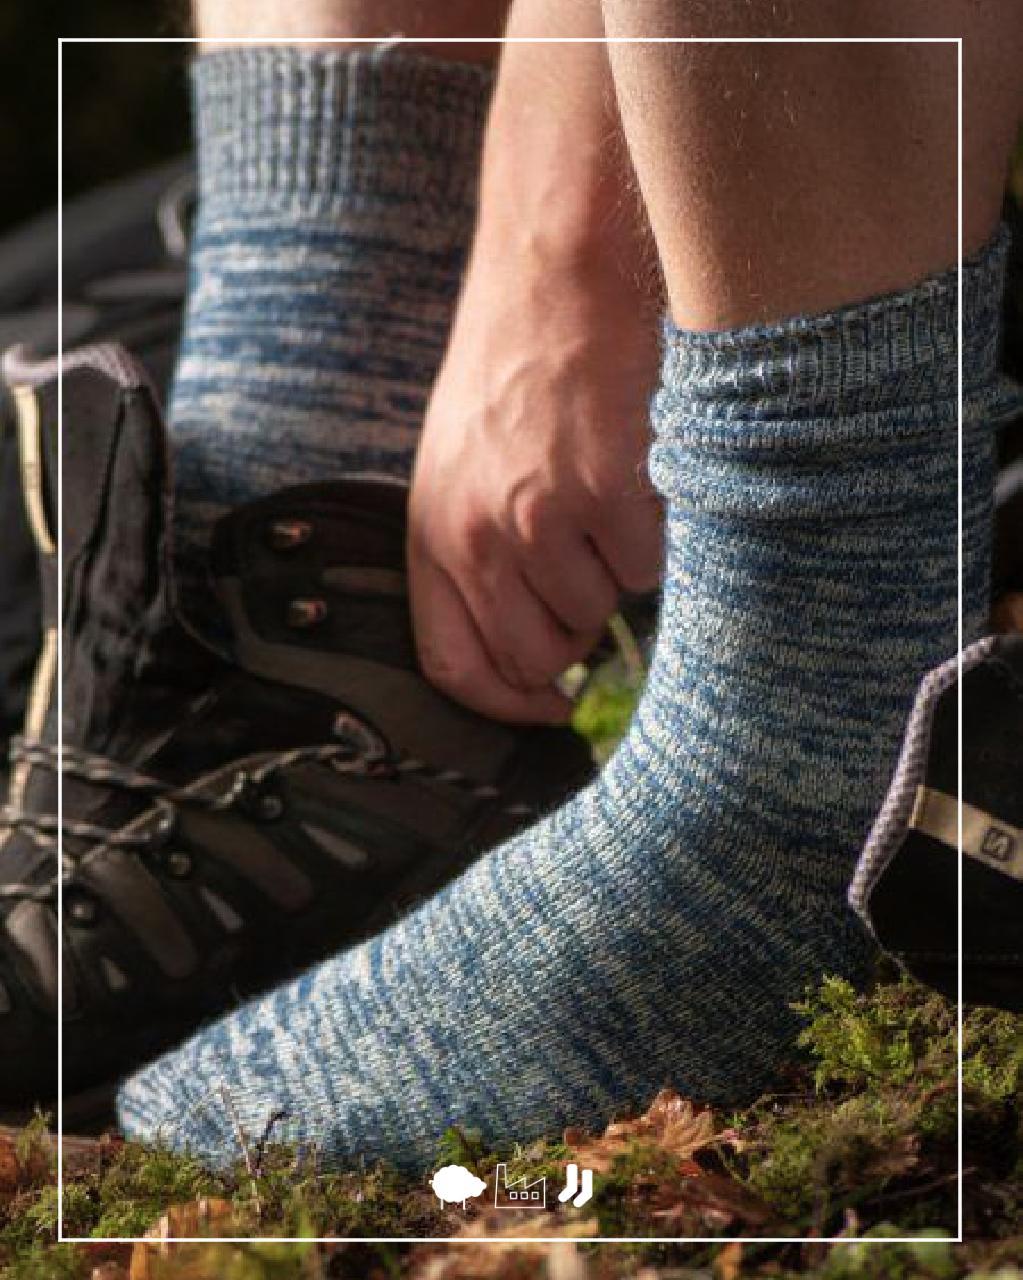 walking-socks-from-the-yorkshre-sock-company